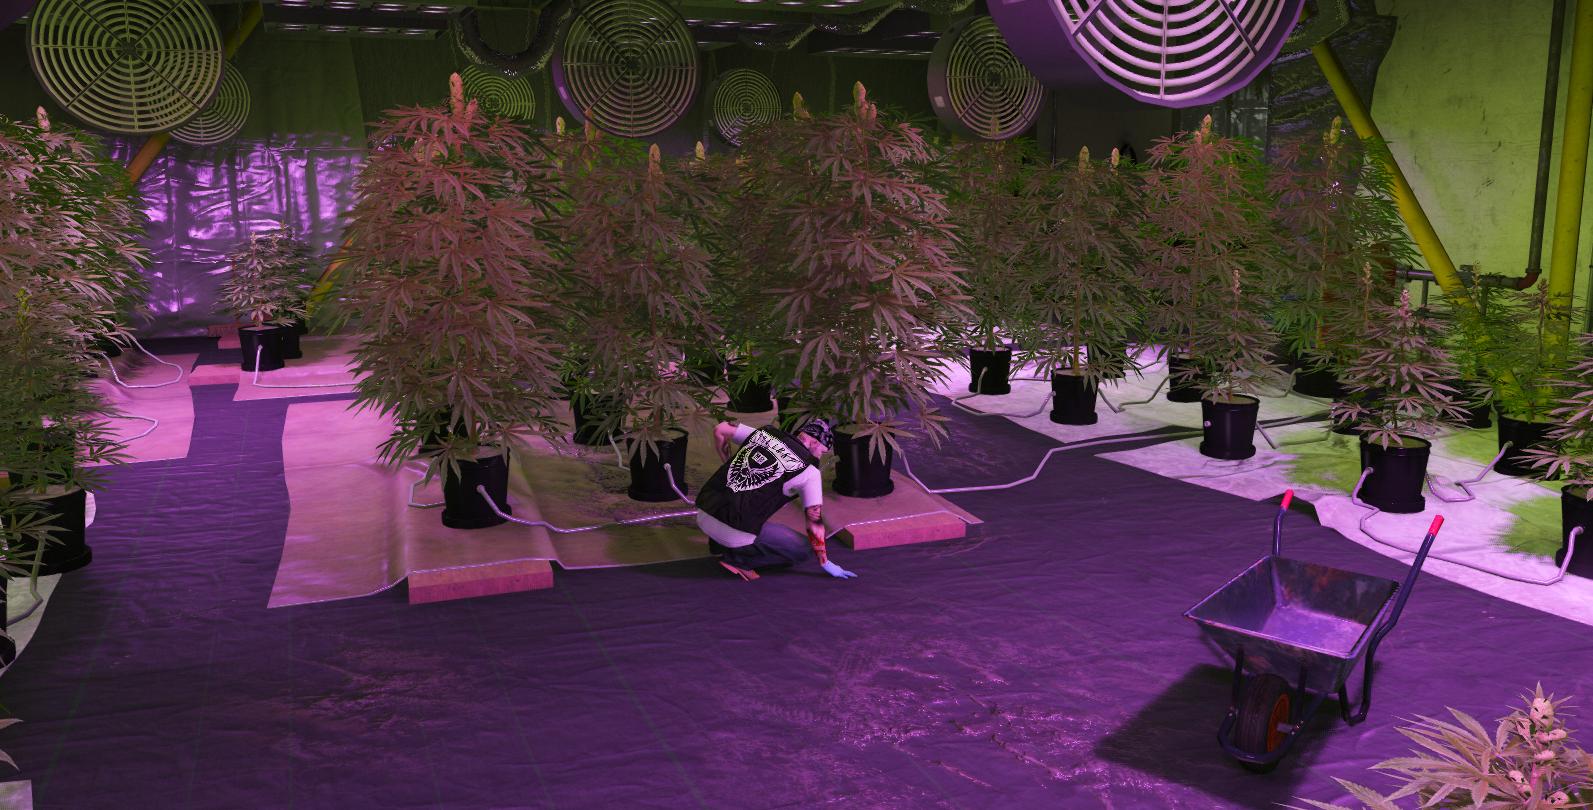 weed_sc.png